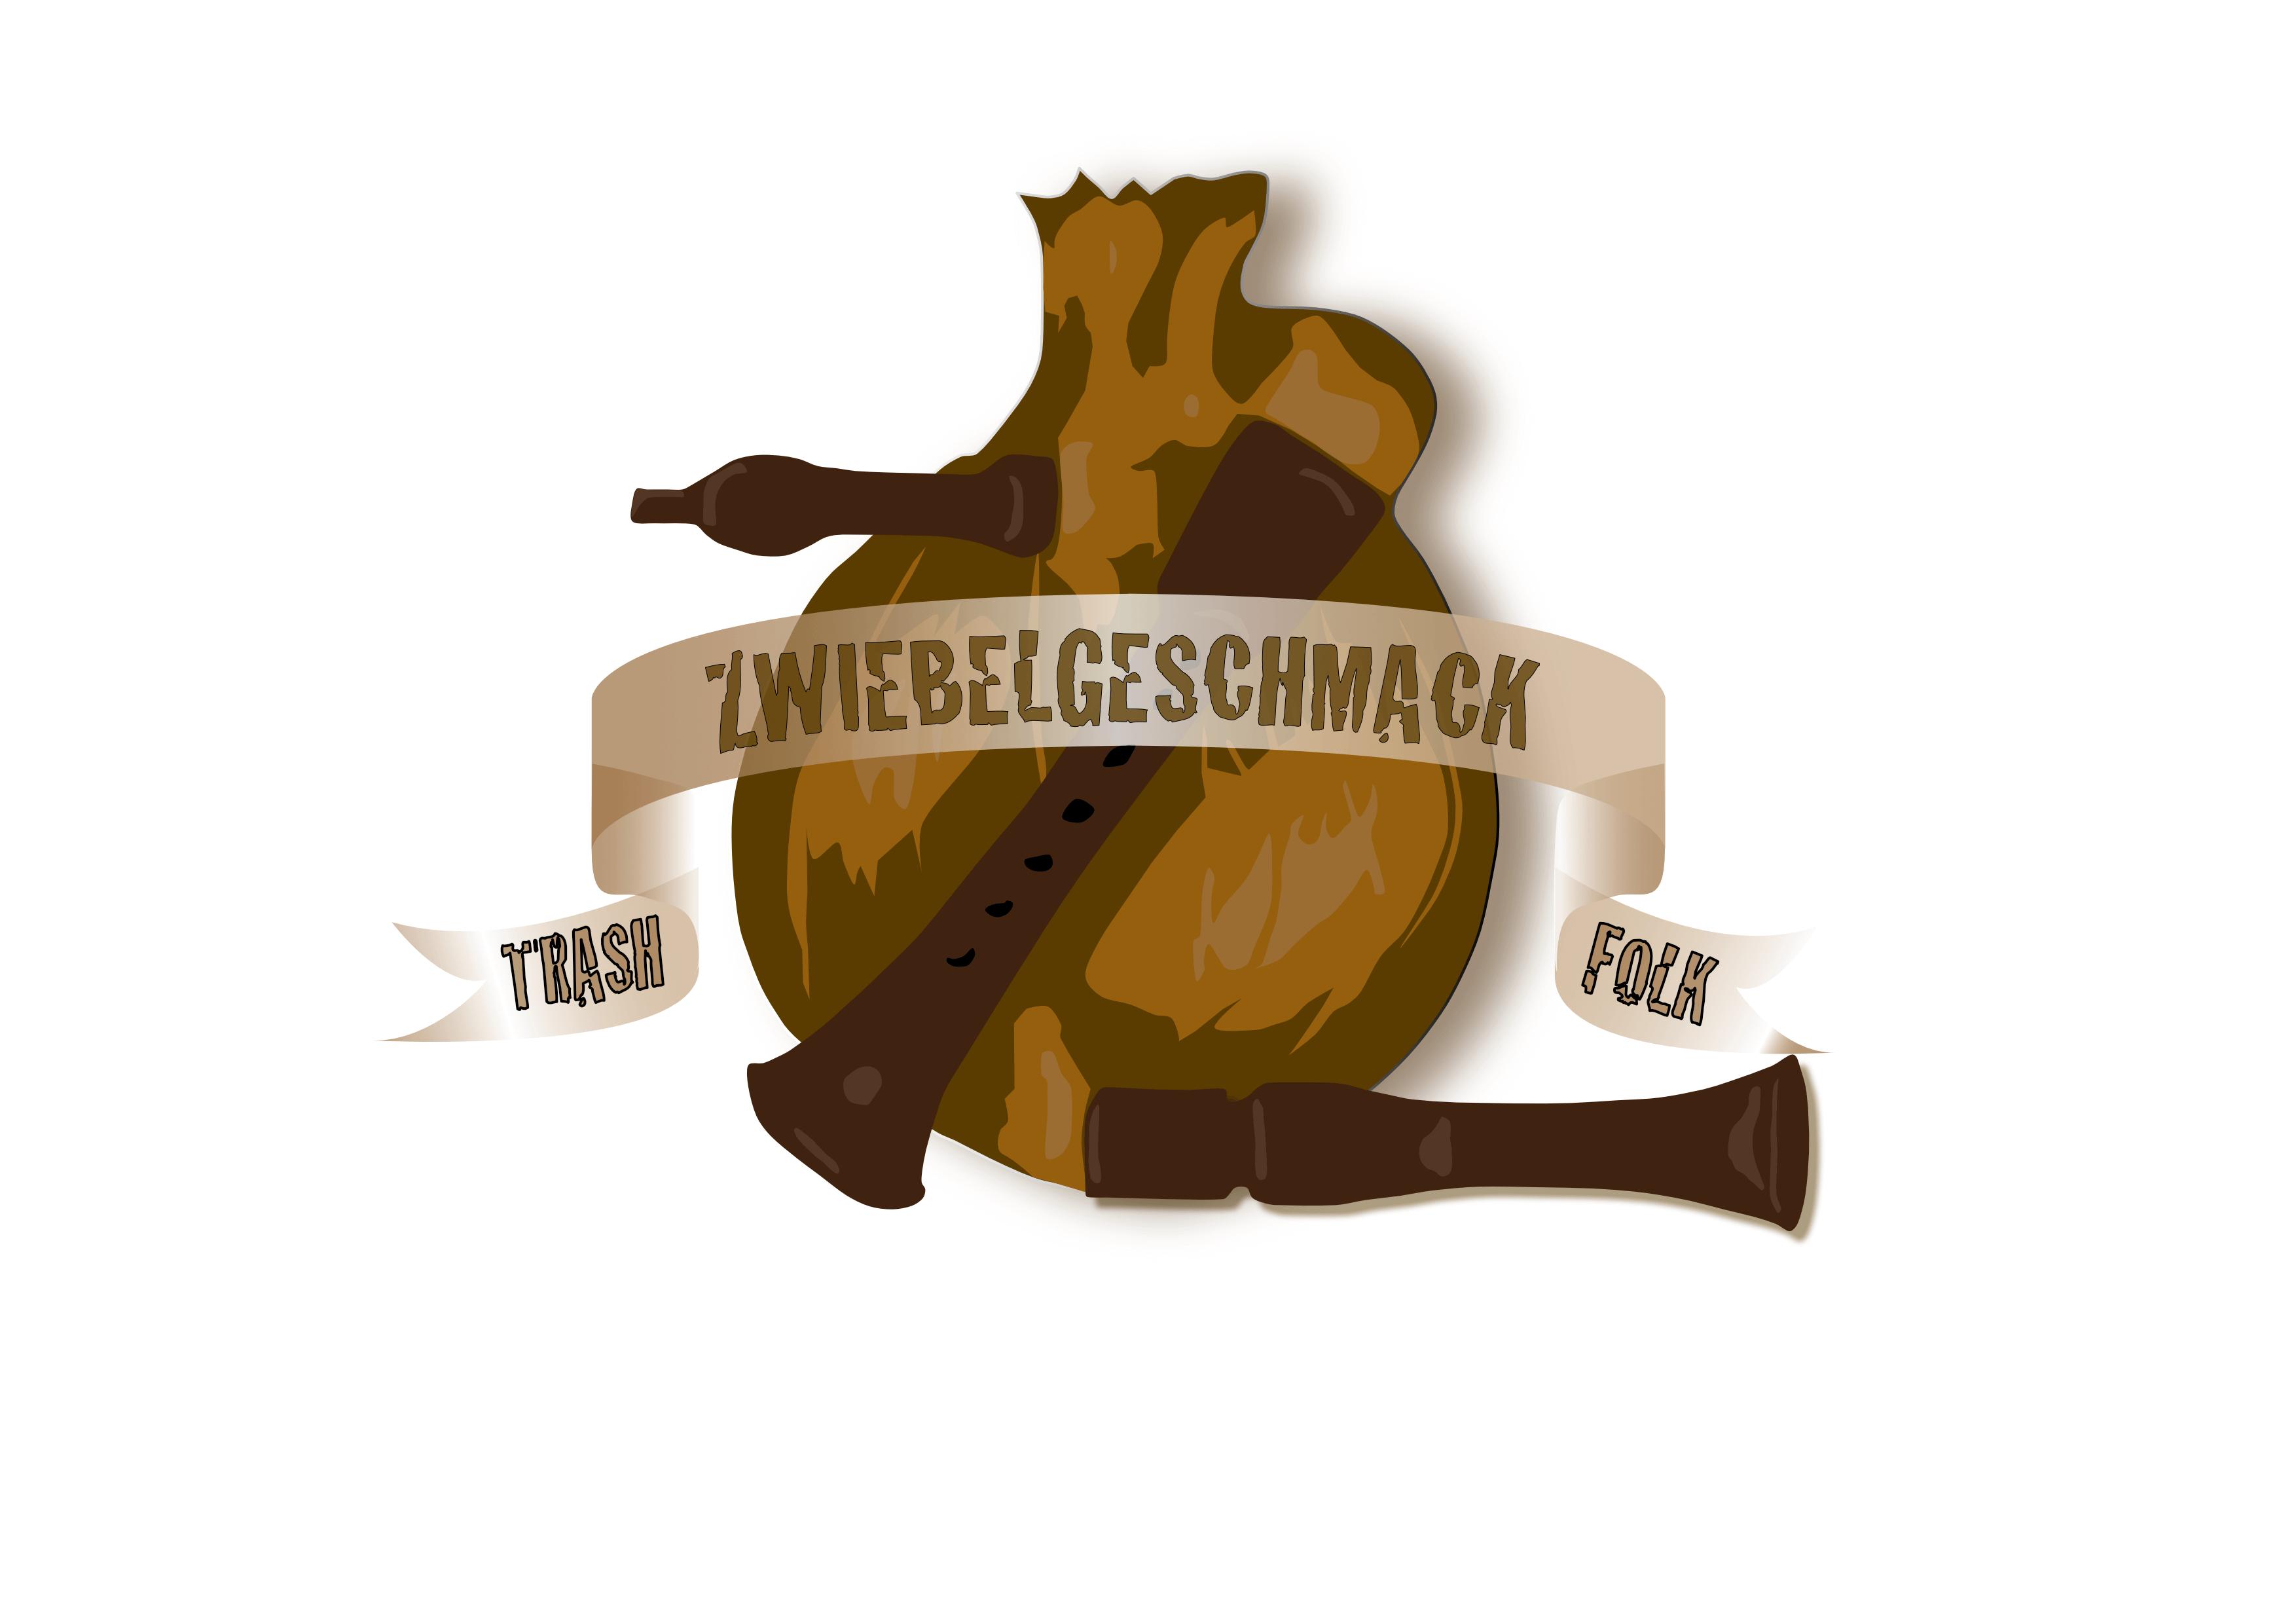 Zwiebelgeschmack Logo Dudelsack Mittelalterband